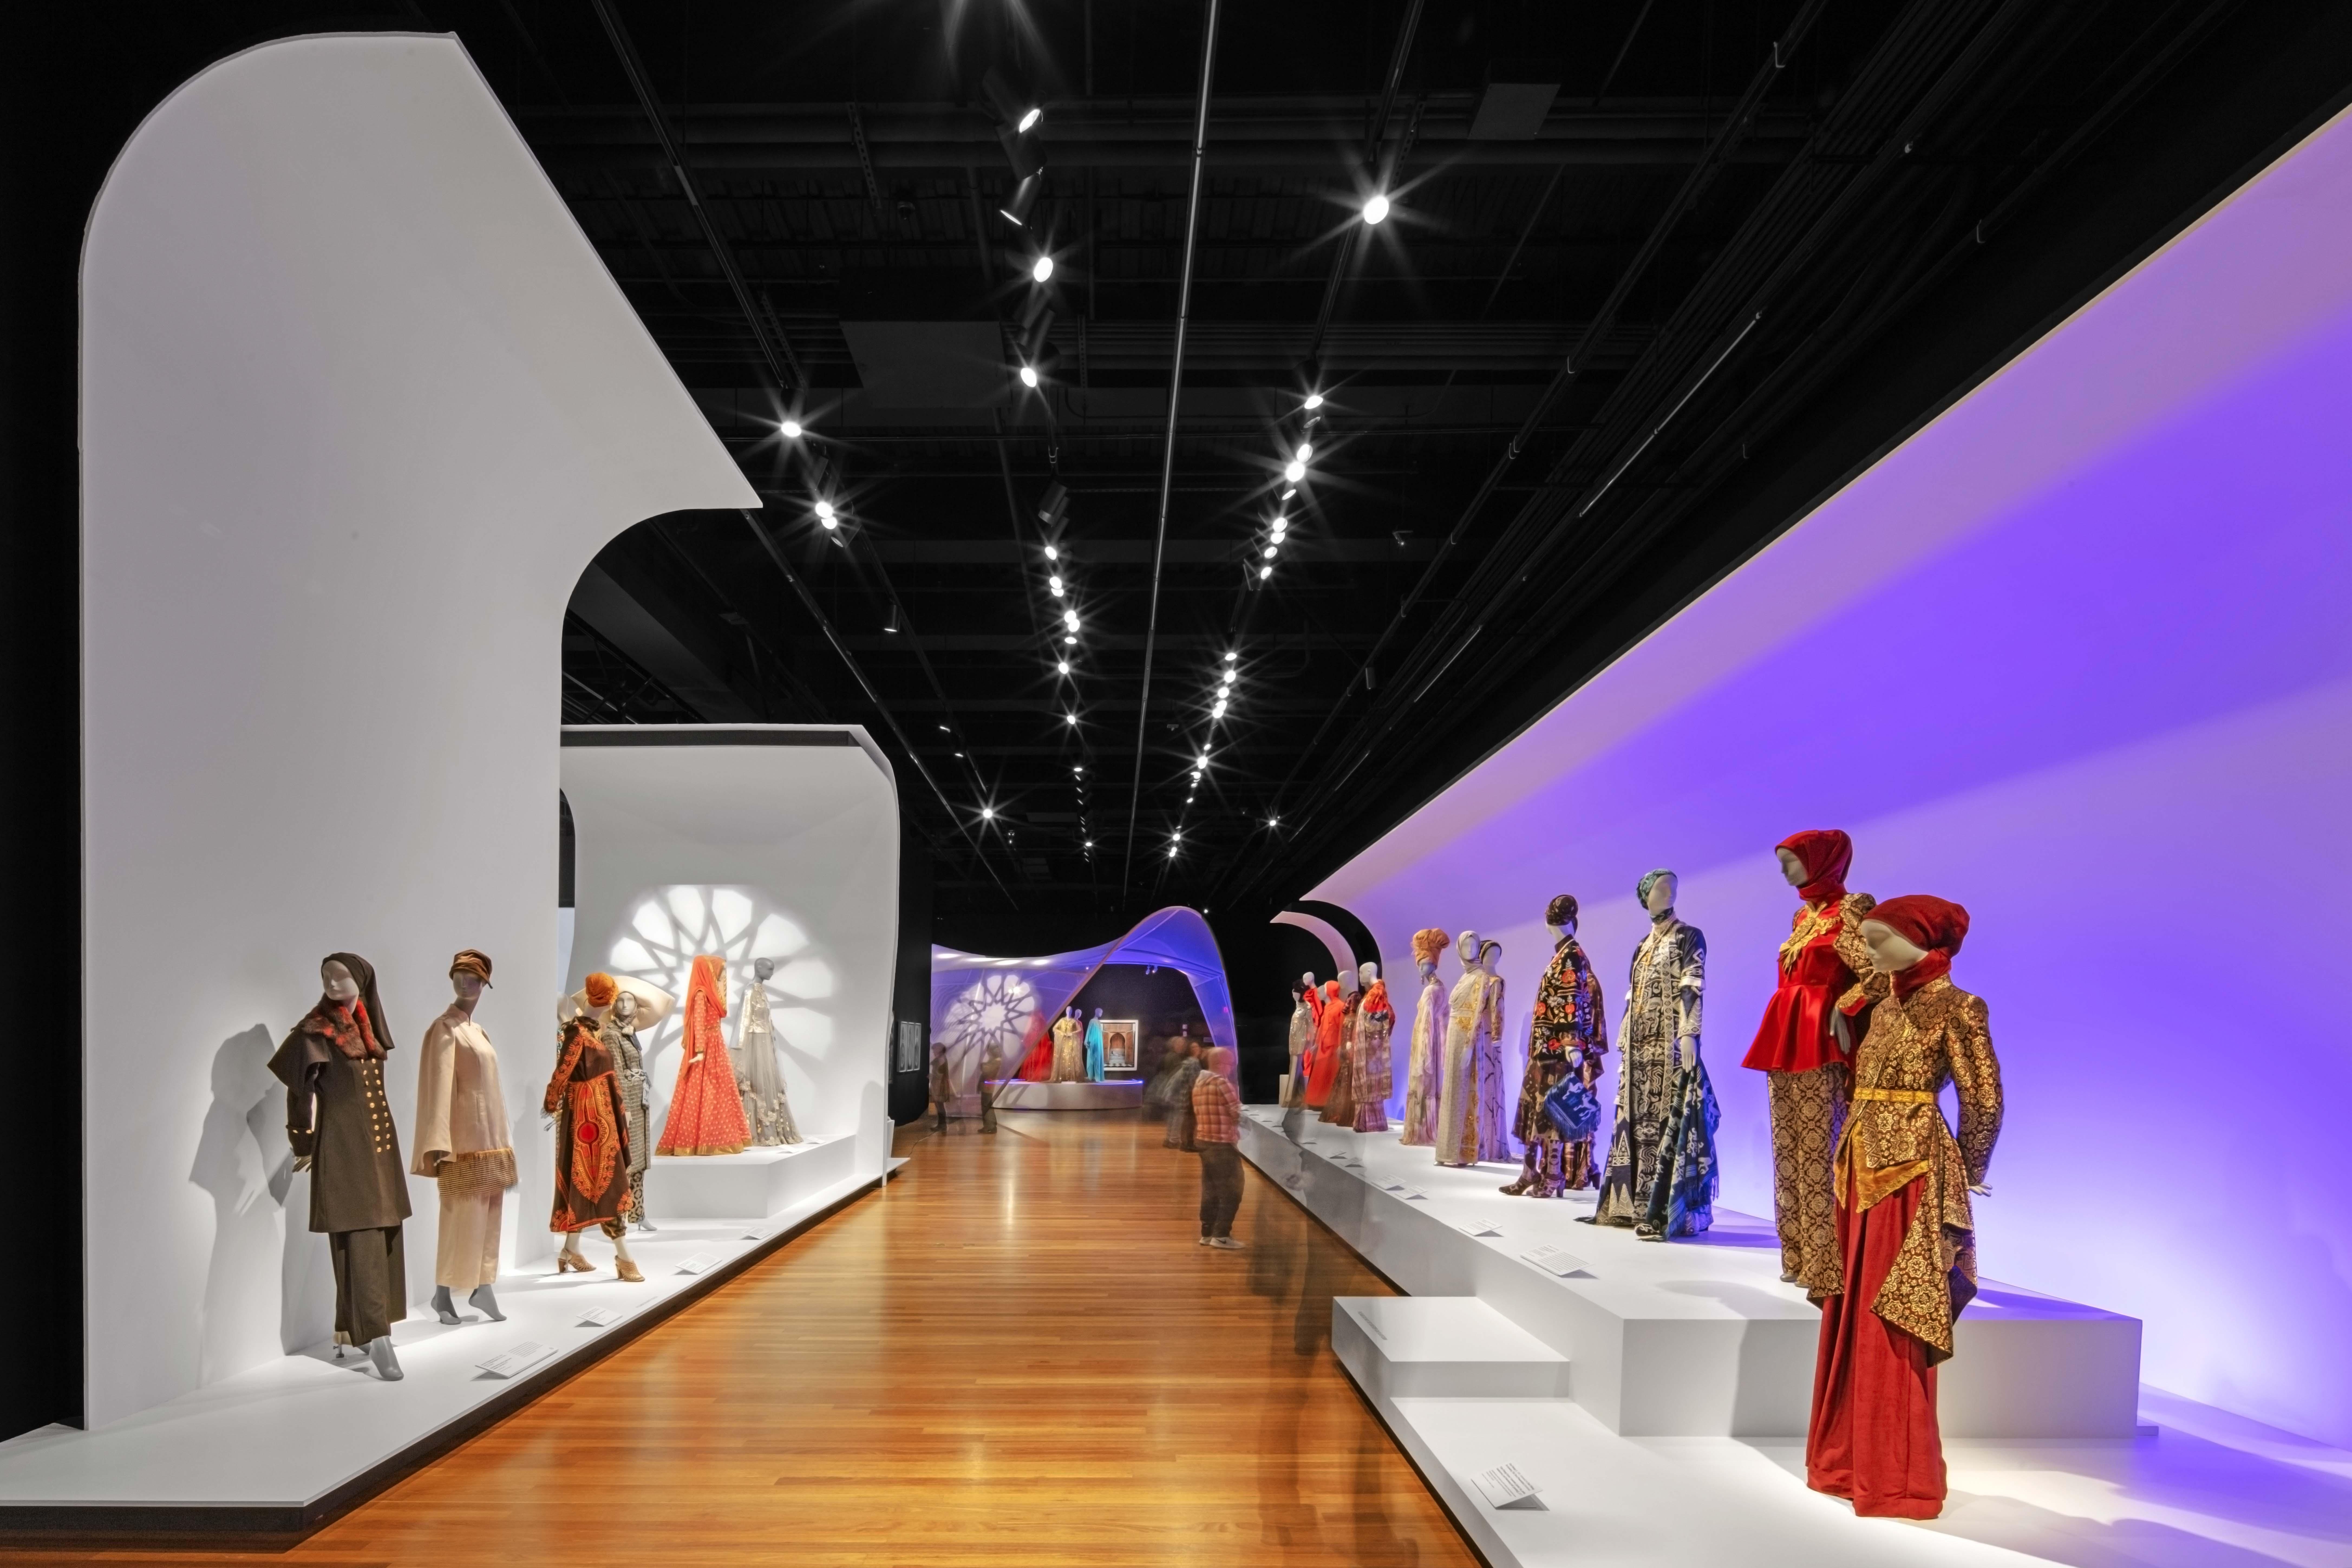 Contemporary Muslim Fashions, De Young Museum